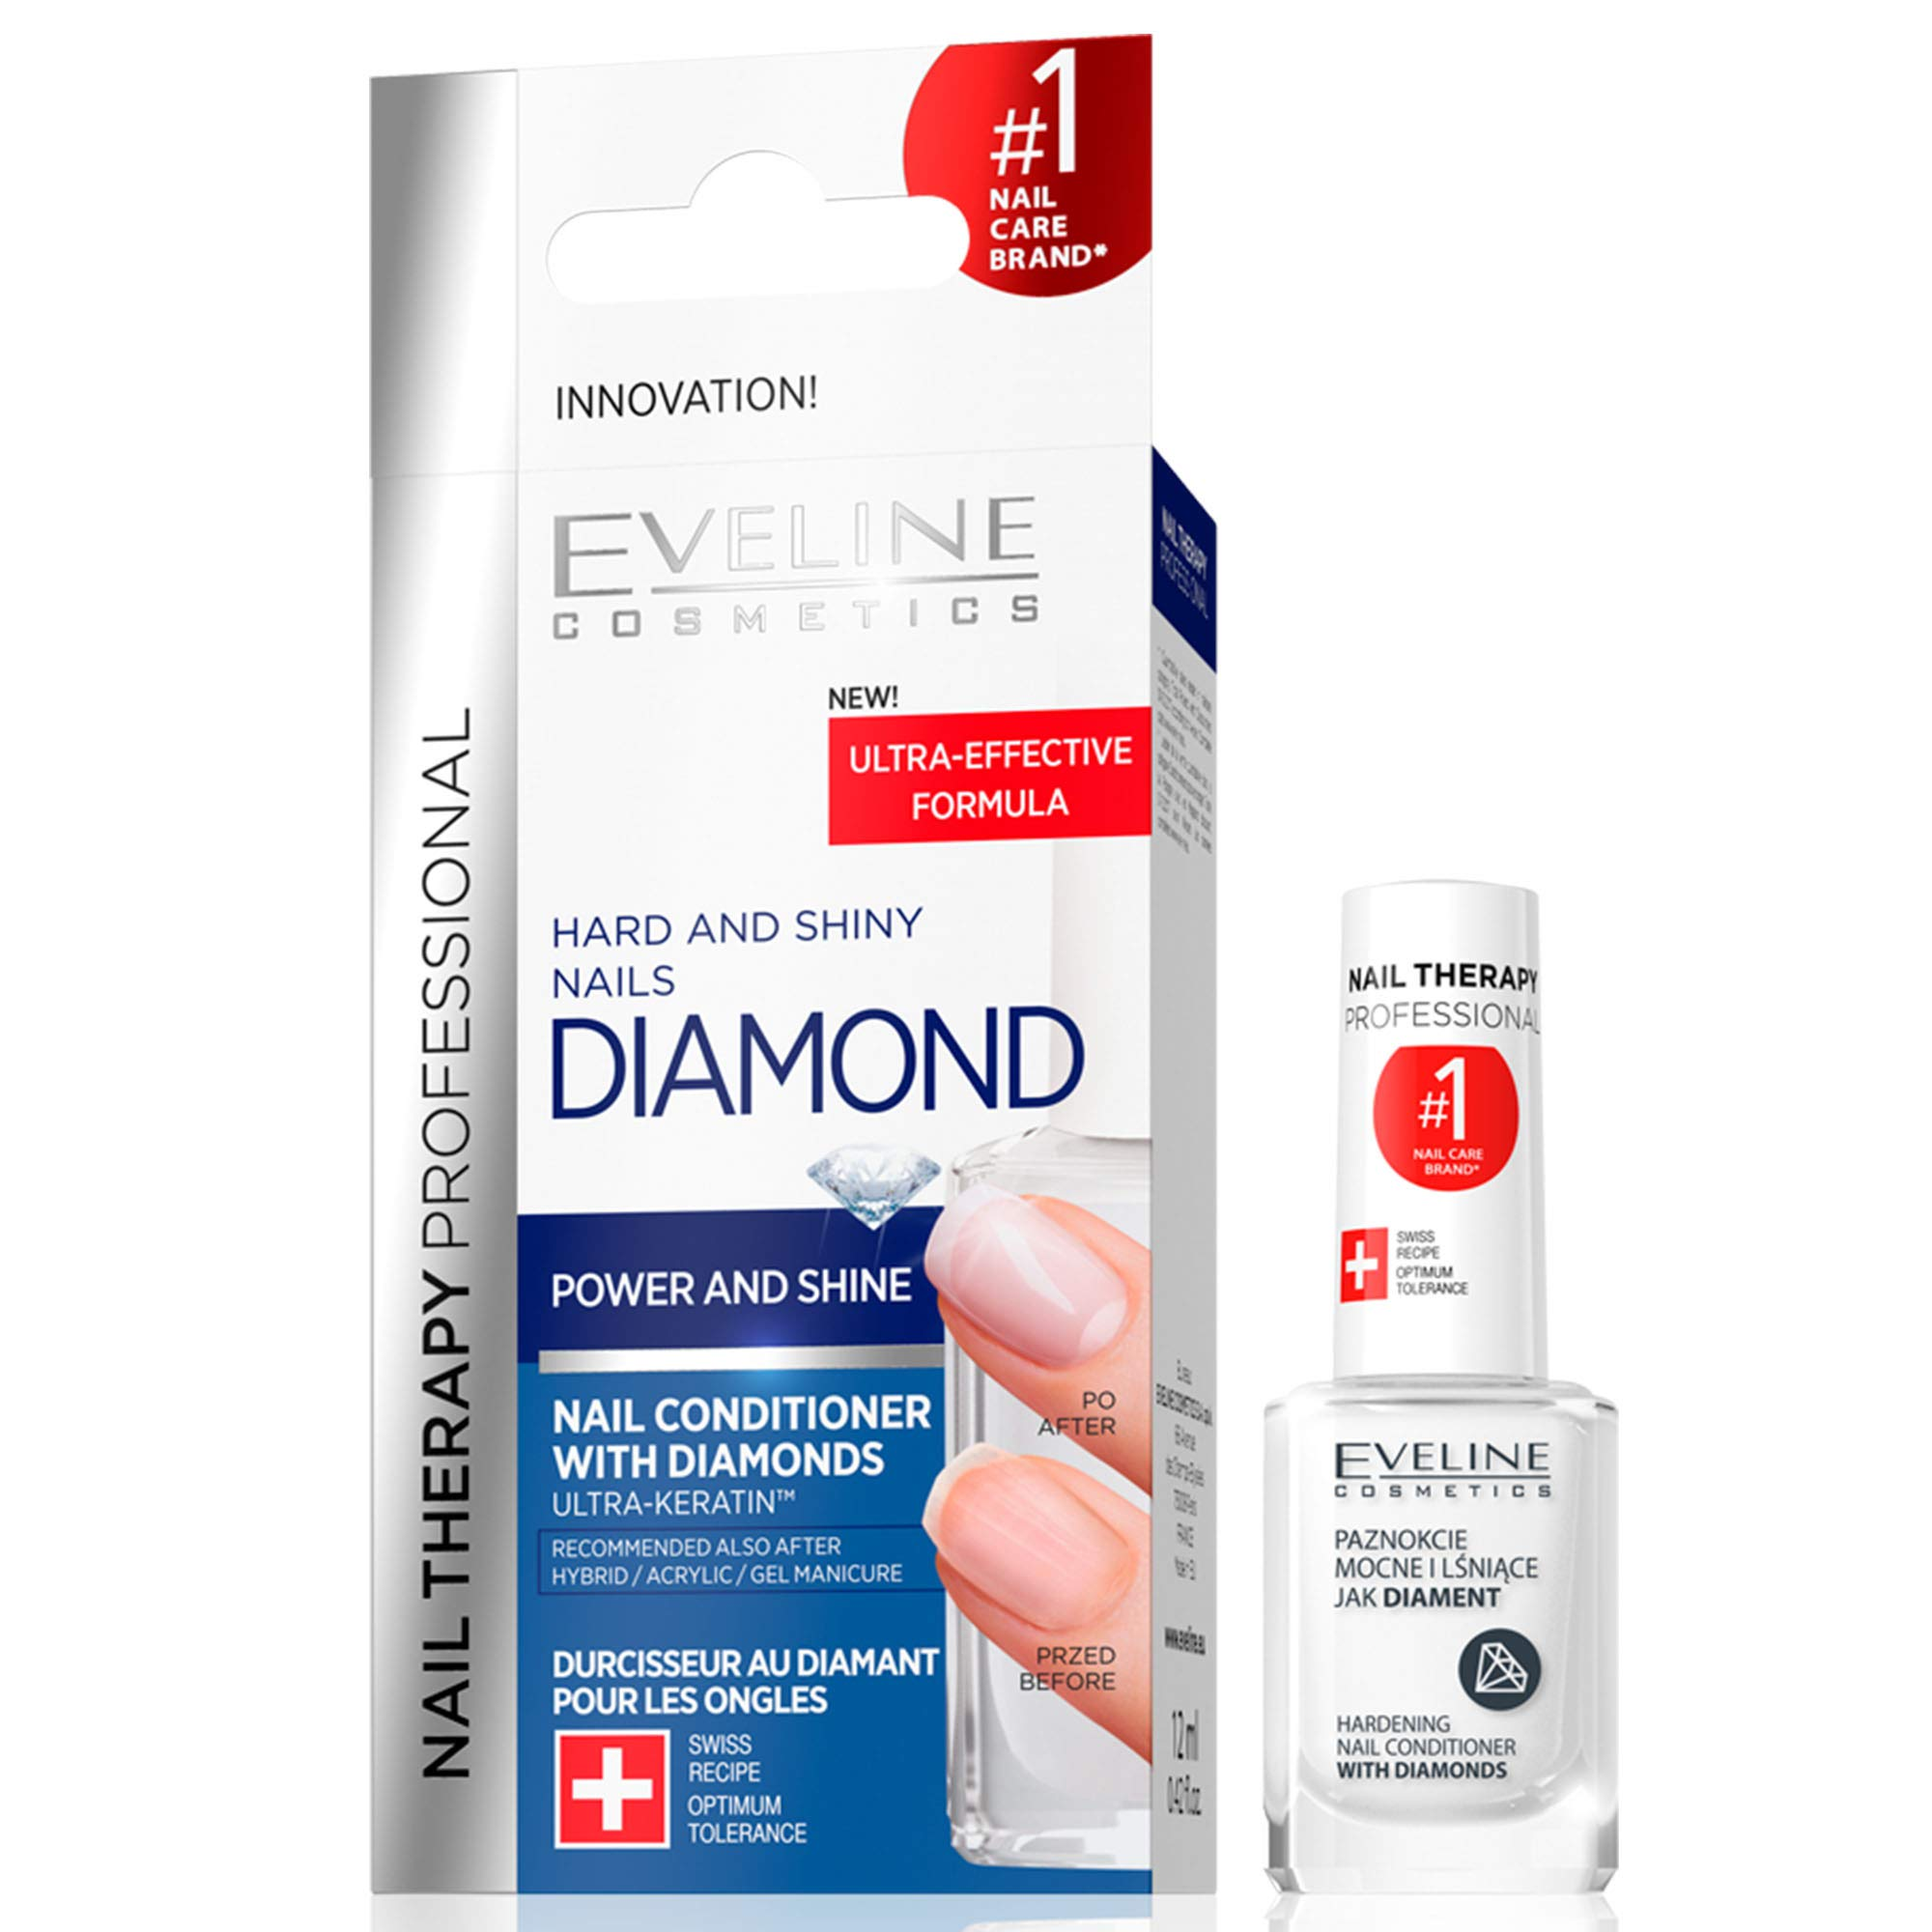 Eveline Cosmetics Diamond Nail Professional Therapy Conditioner Hardener Strengthener   12 ML   Repair Treatment Nail Serum   Formaldehyde-free   Titanium Formula